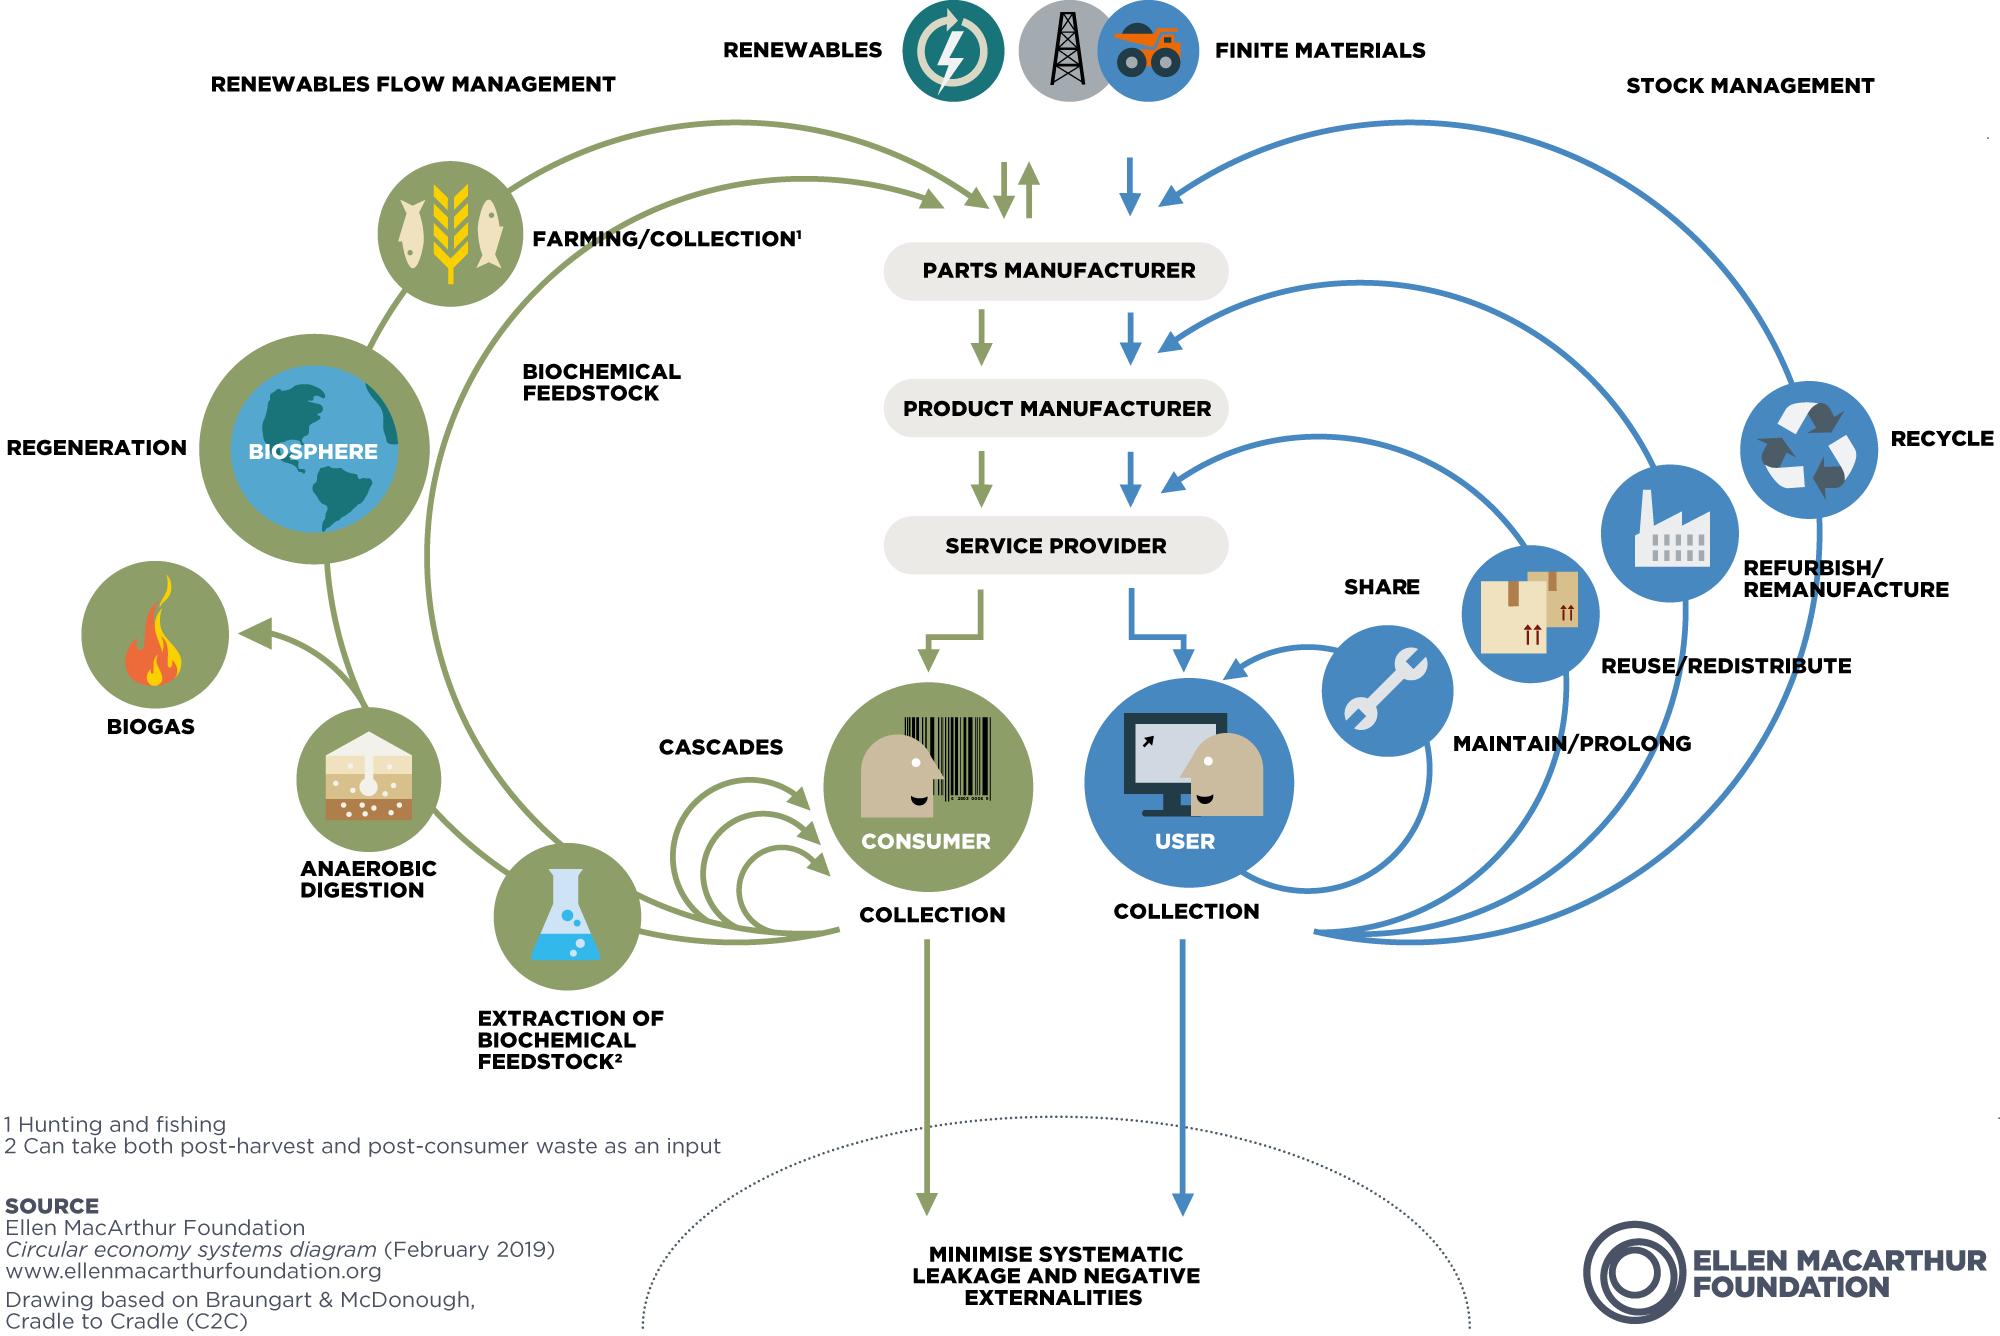 Ellen Macarthur Foundation's circular economy systems diagram.